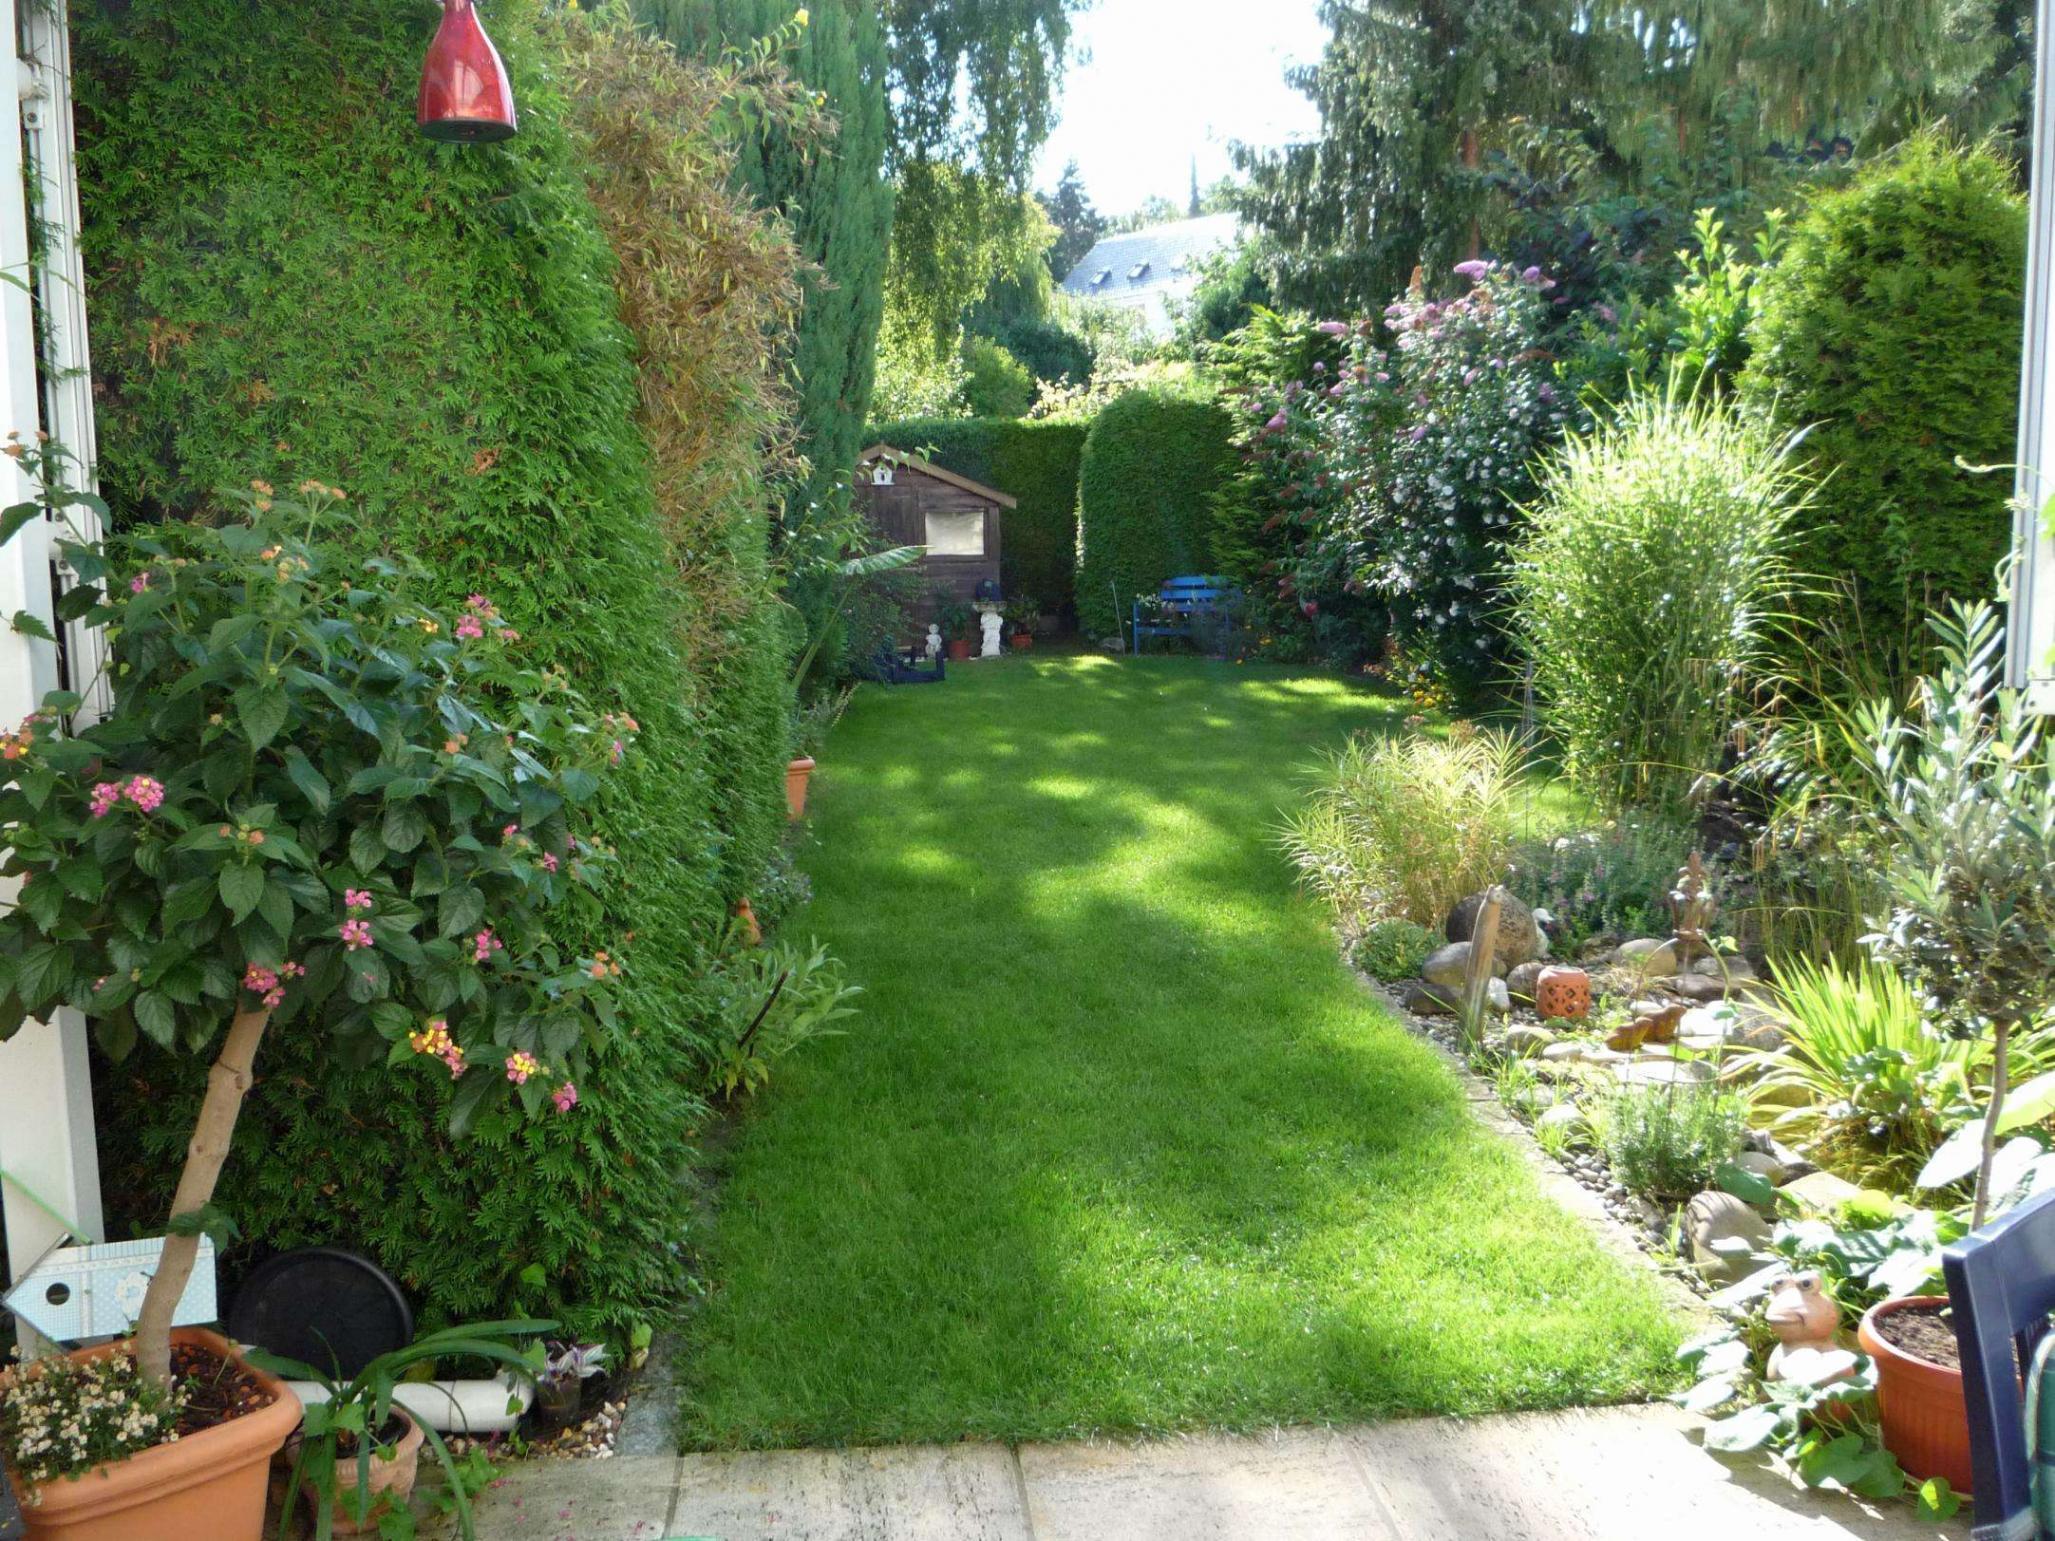 22 Neu Gartenpflanzen Pflegeleicht Garten Deko